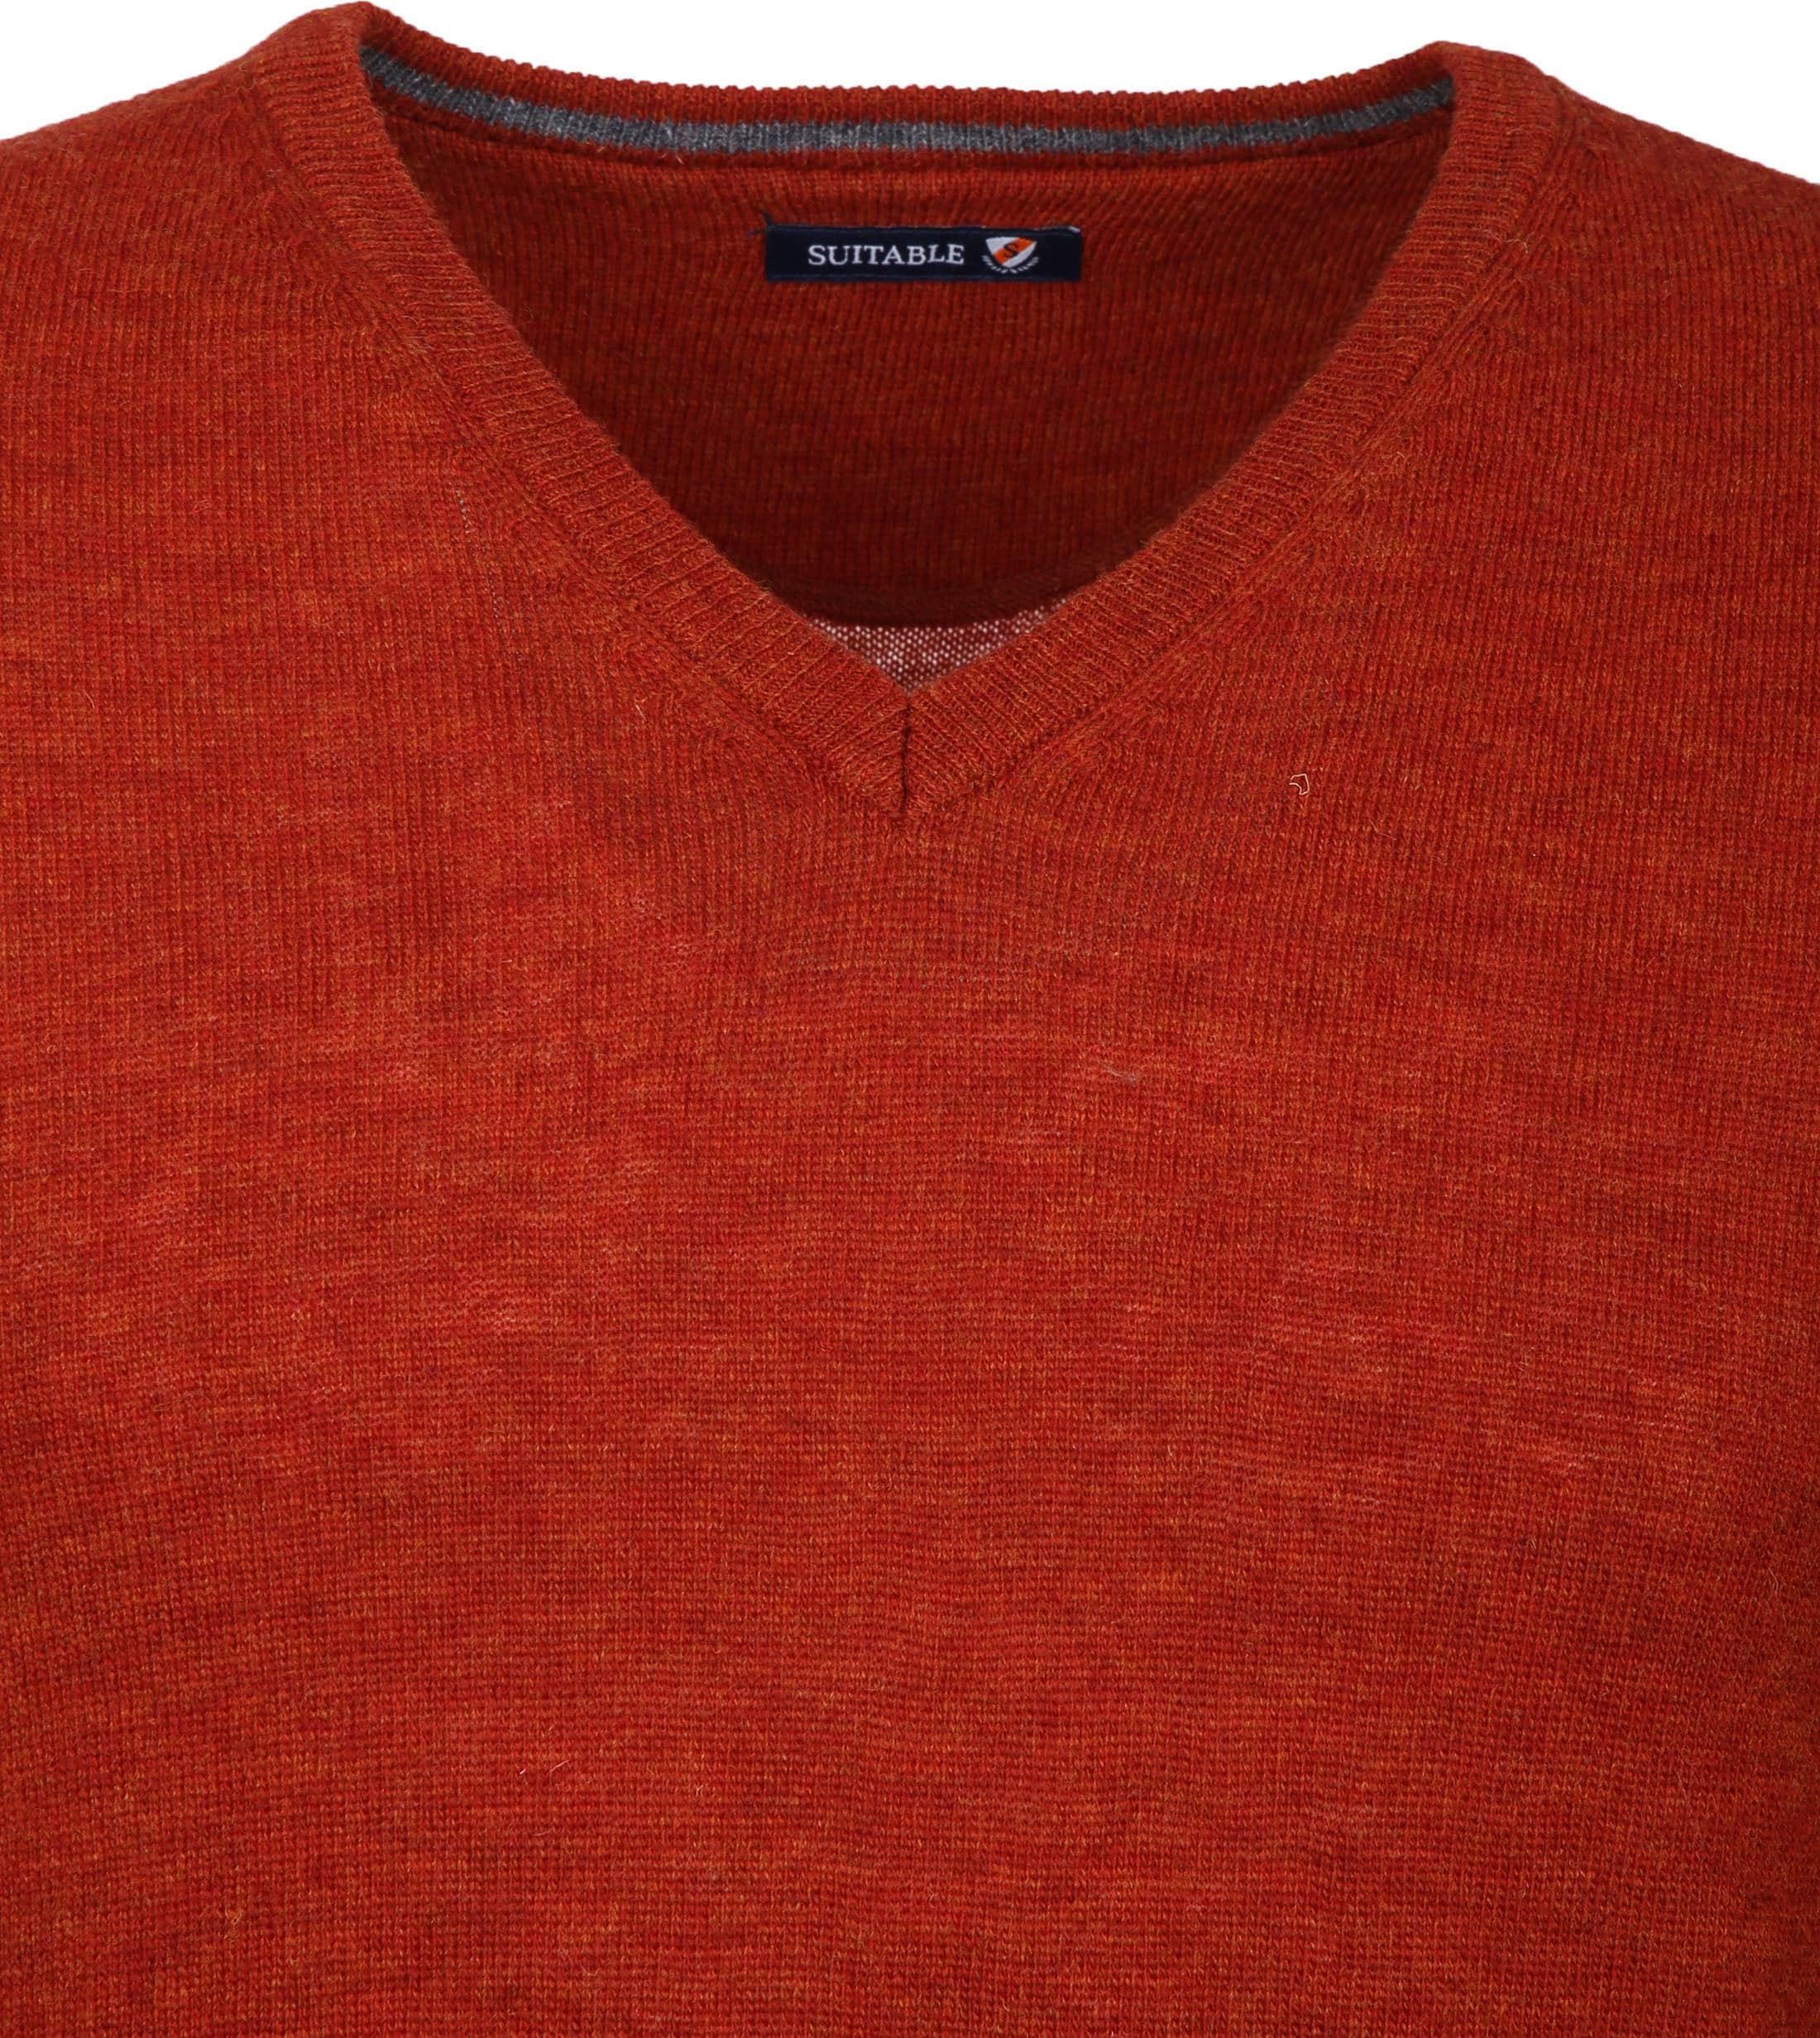 Suitable Pullover V-Neck Lambswool Orange foto 2